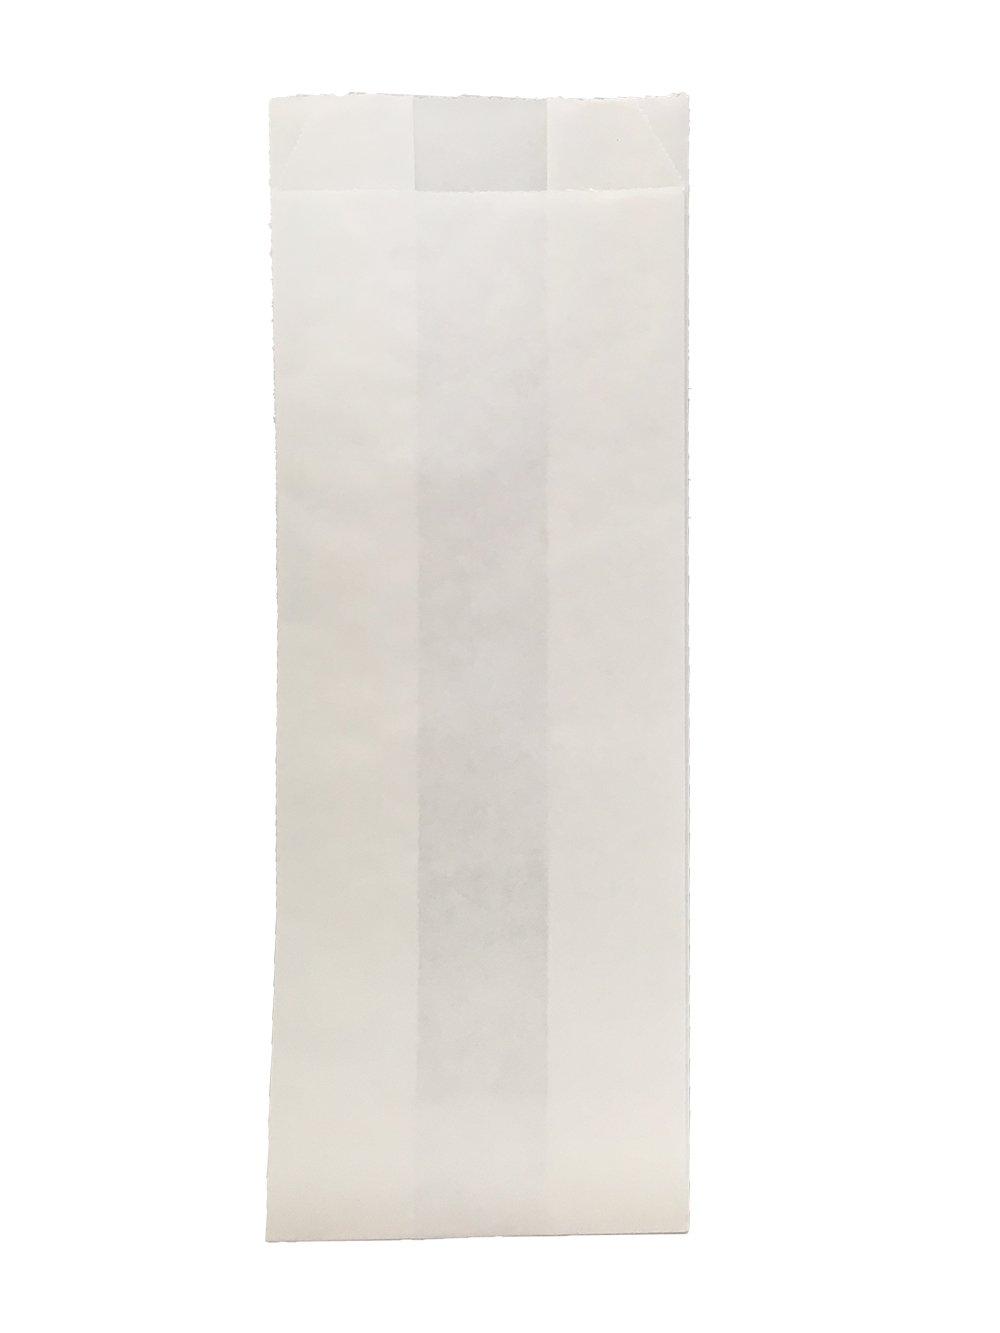 Durable Packaging White Hotdog Bag, 3'' x 2'' x 9'' (Pack of 1,000)